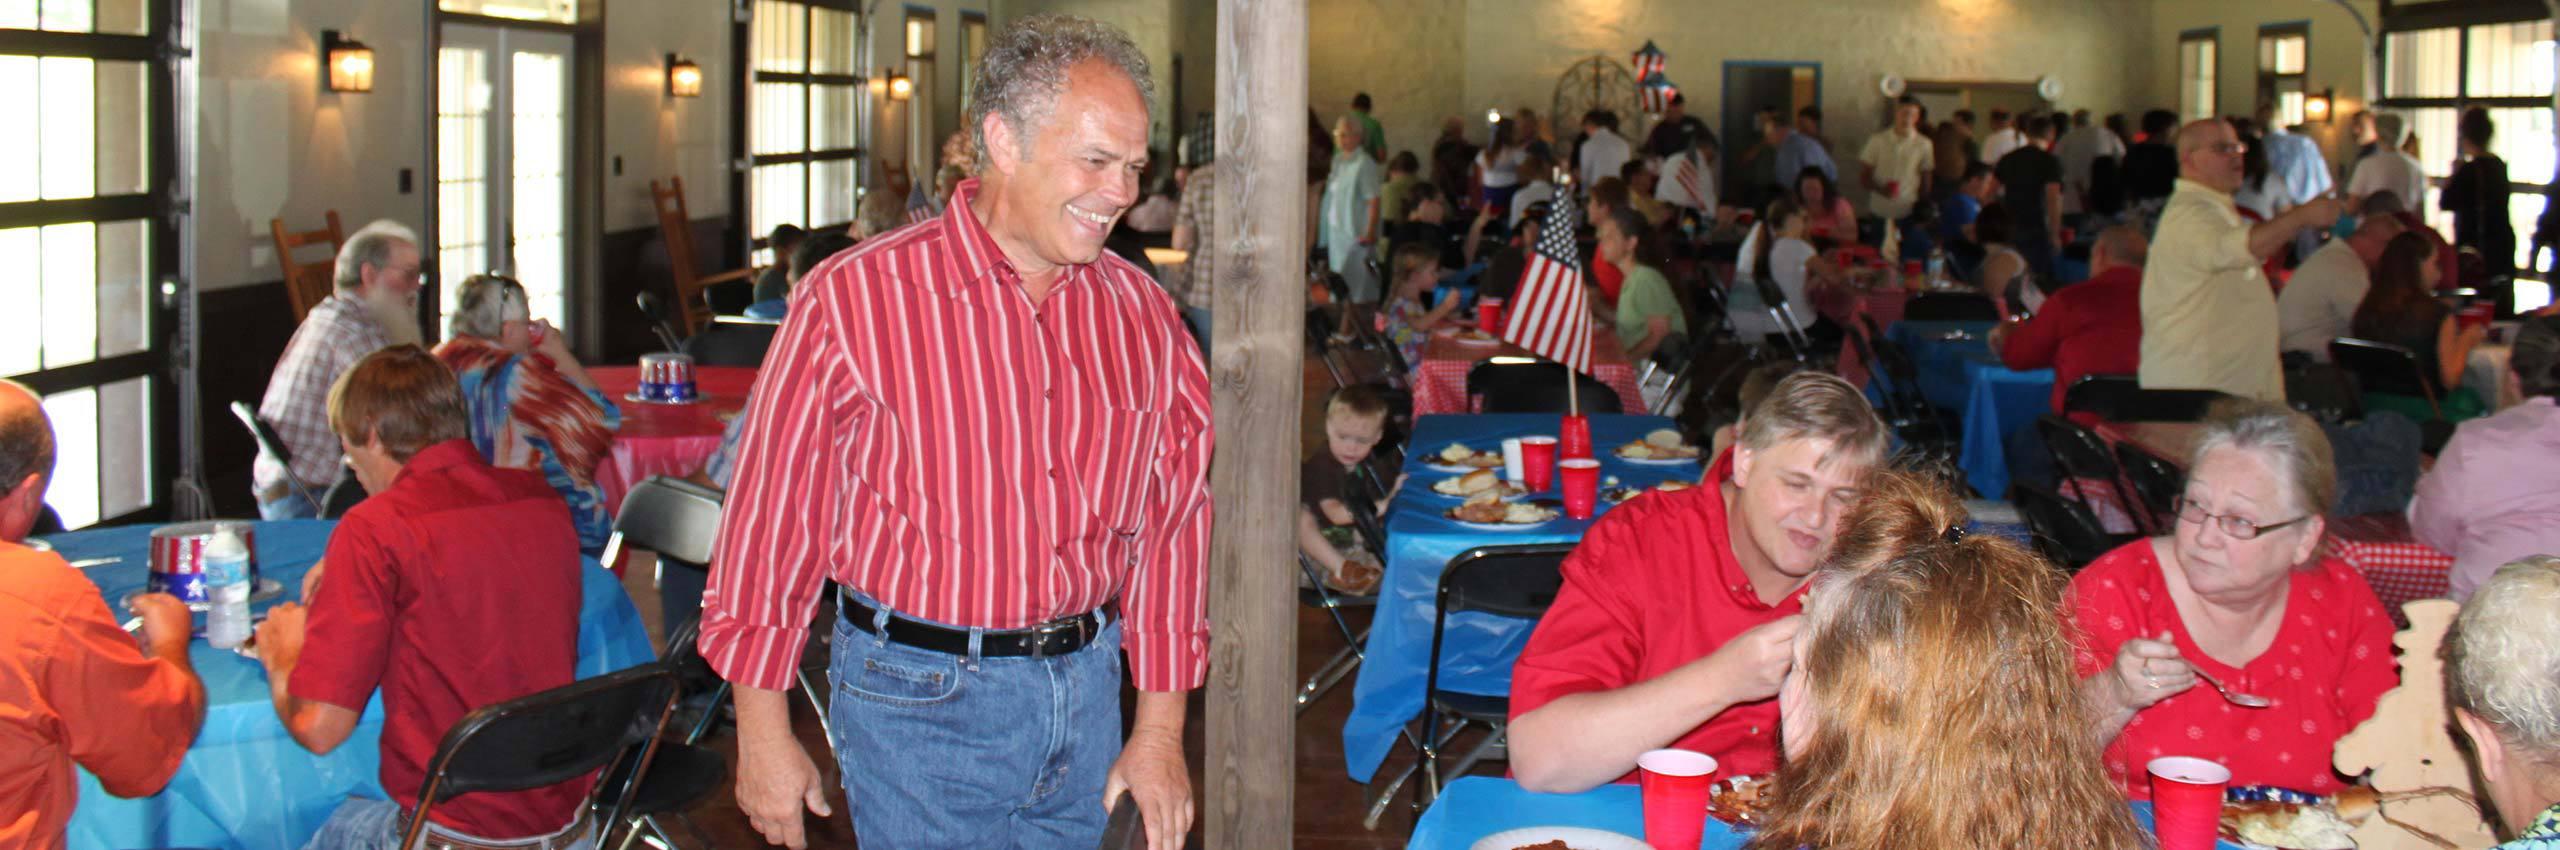 Upcoming Events - Christ Community Church - Henderson, TN